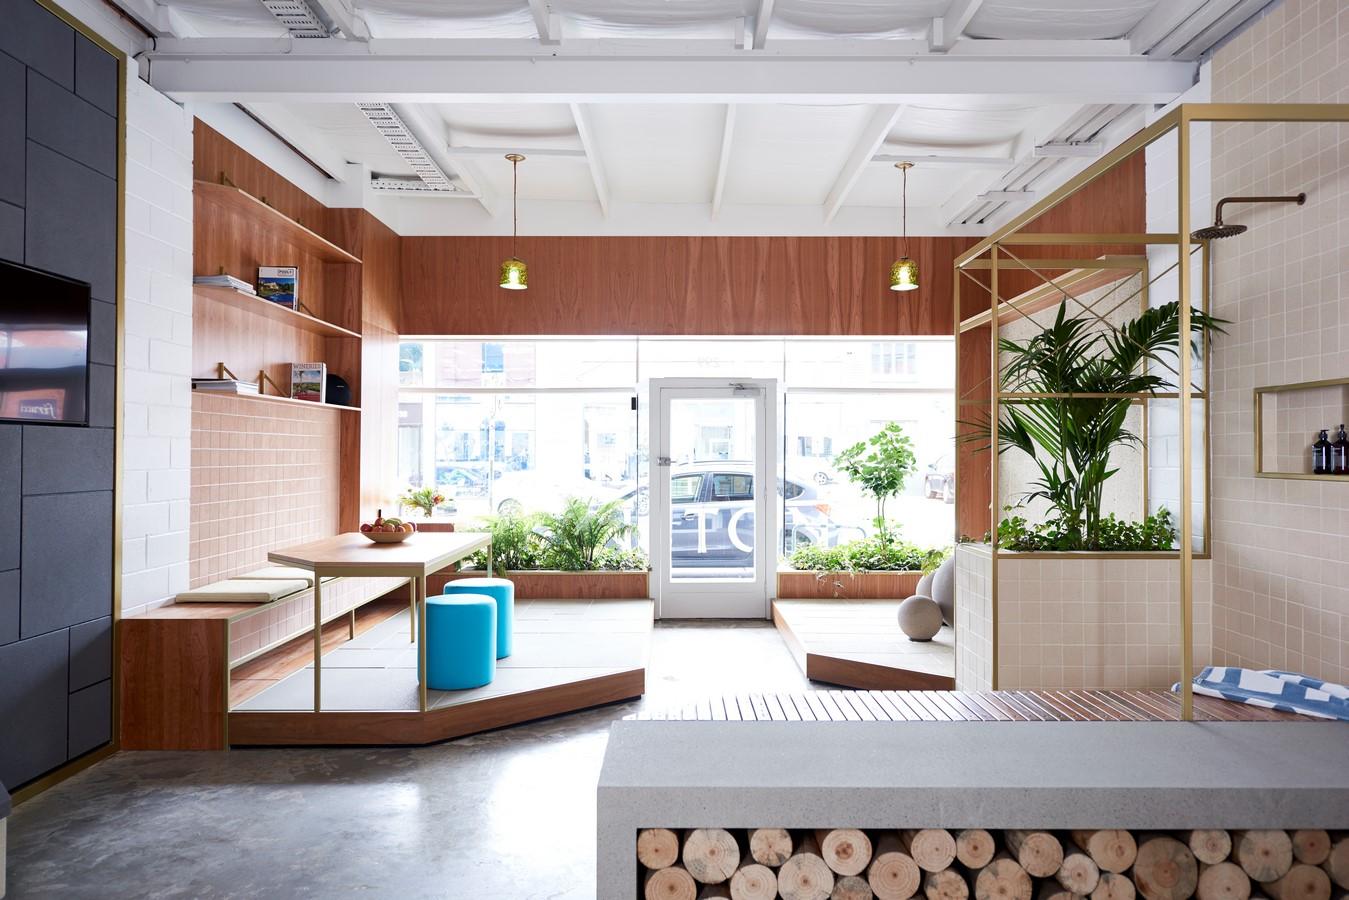 Anston Architectural by Dan Gayfer Design - Sheet1